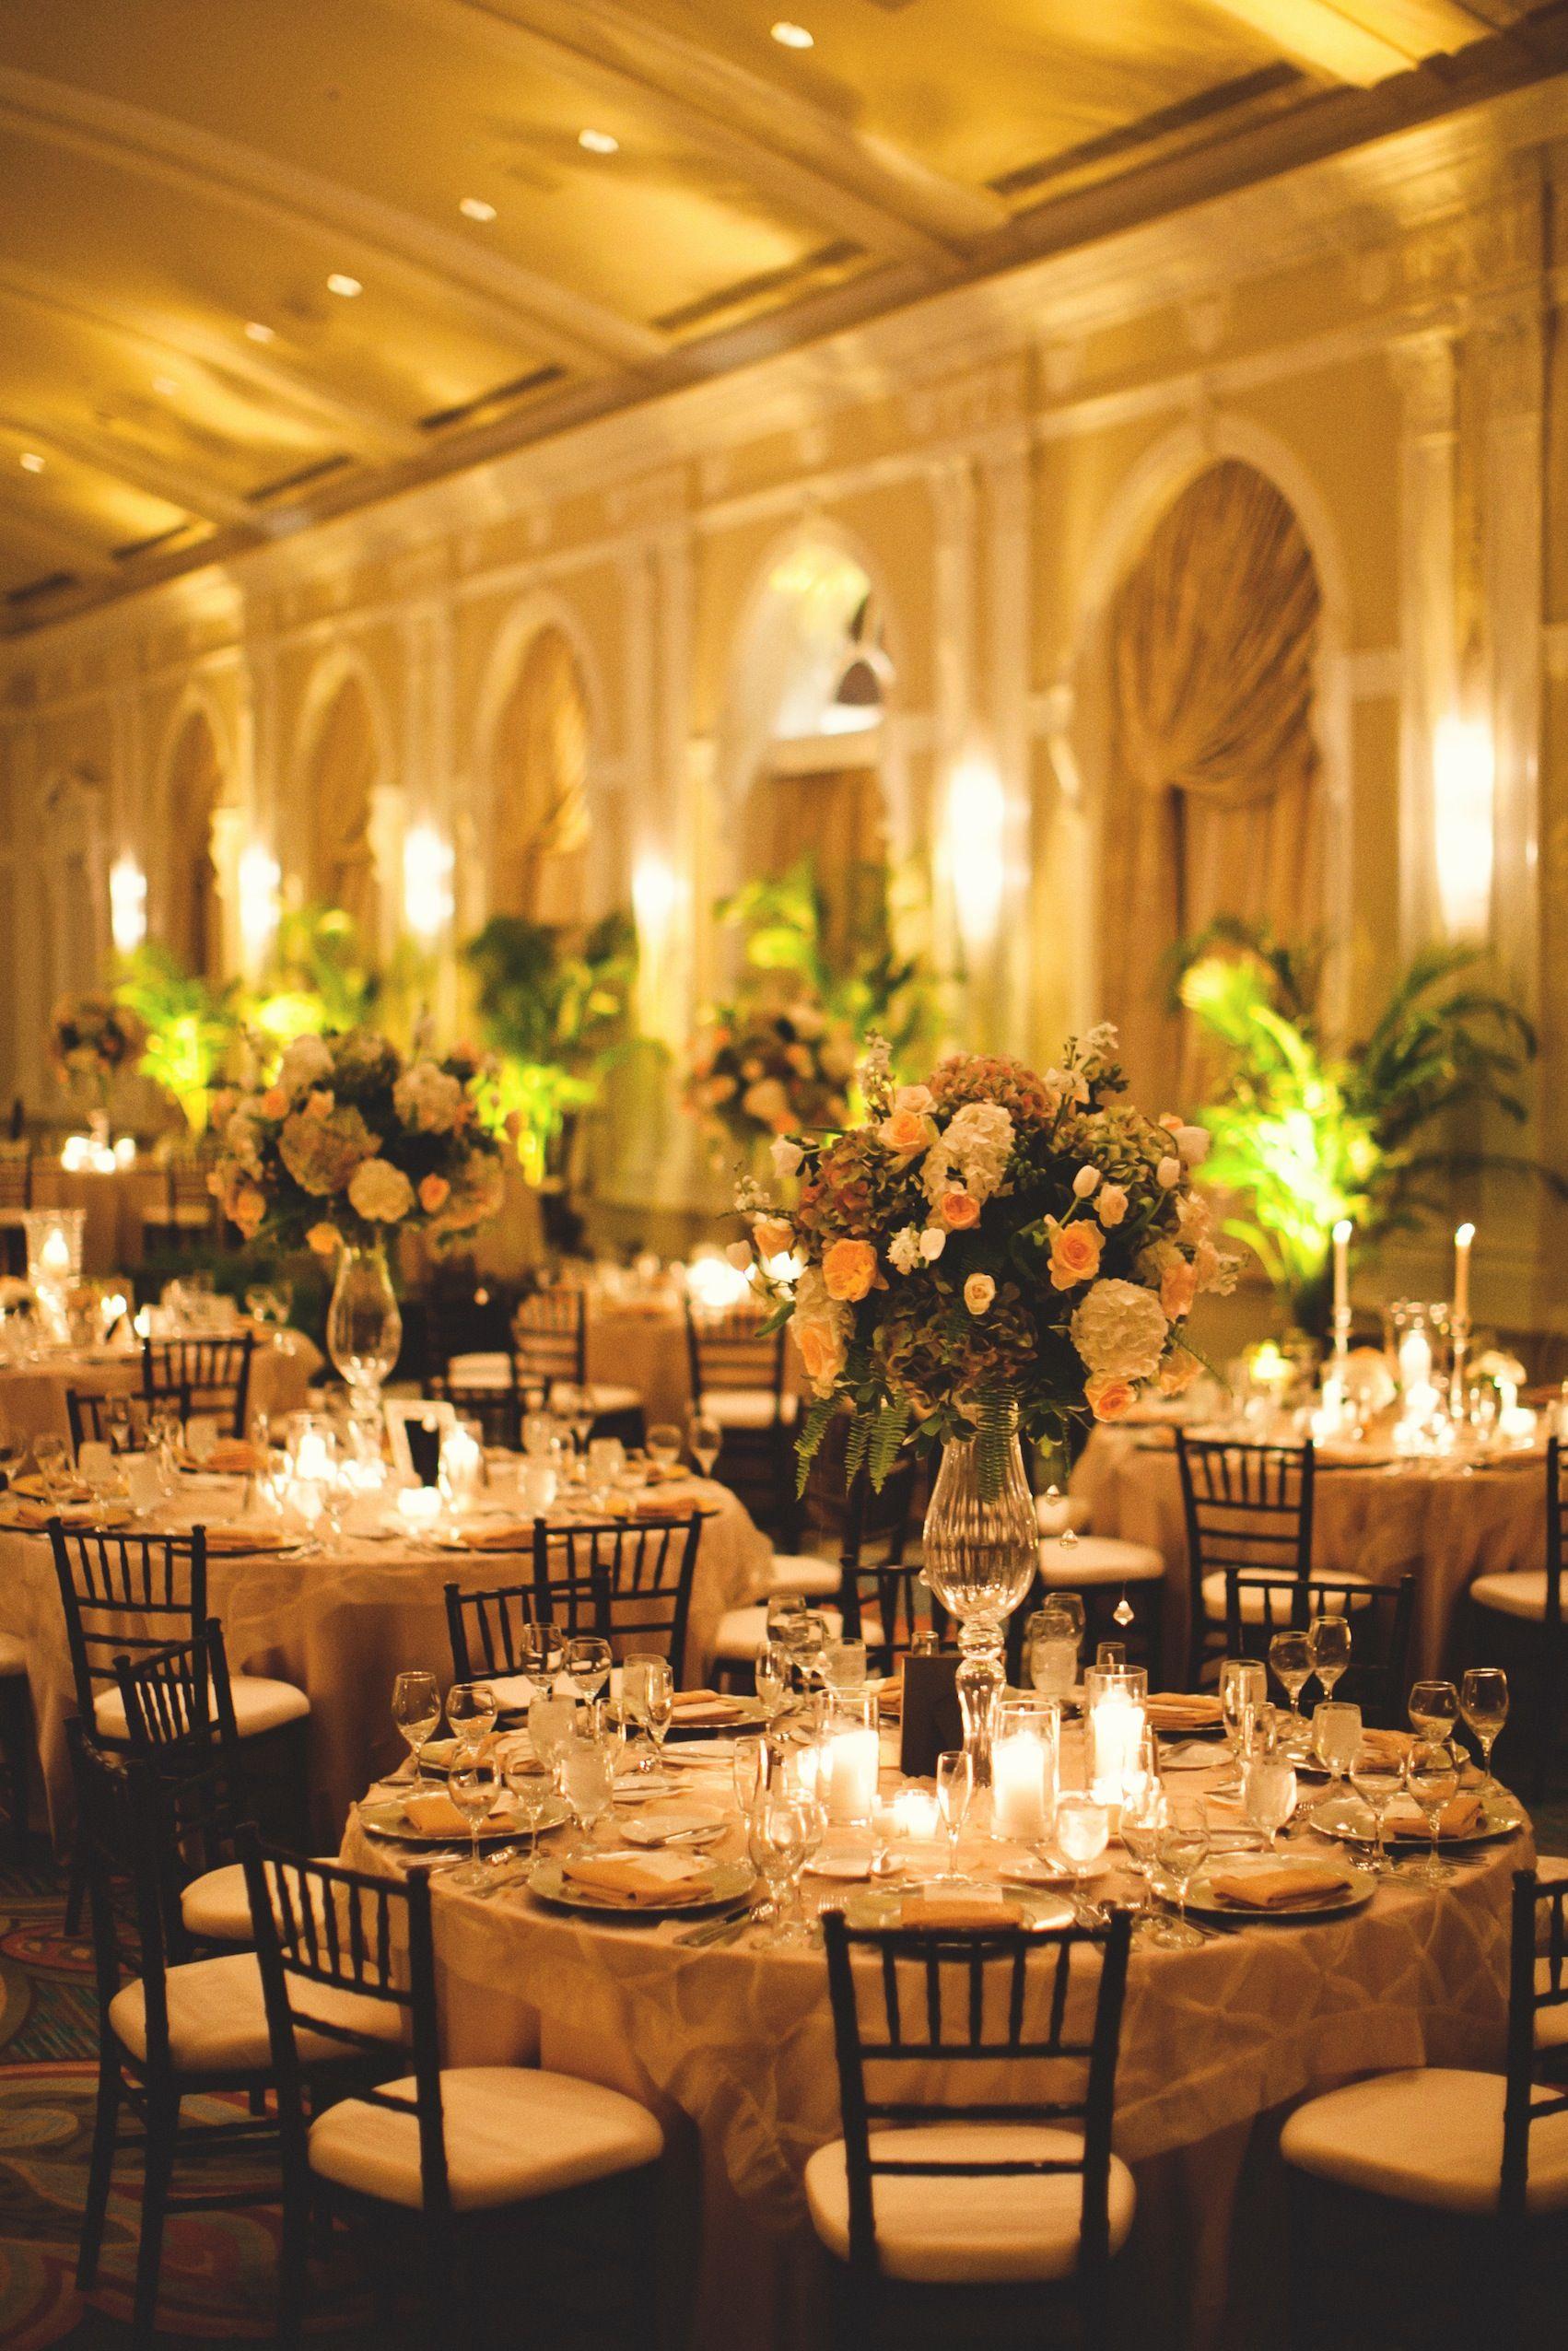 decor and floralbotanica at grand ballroom wedding